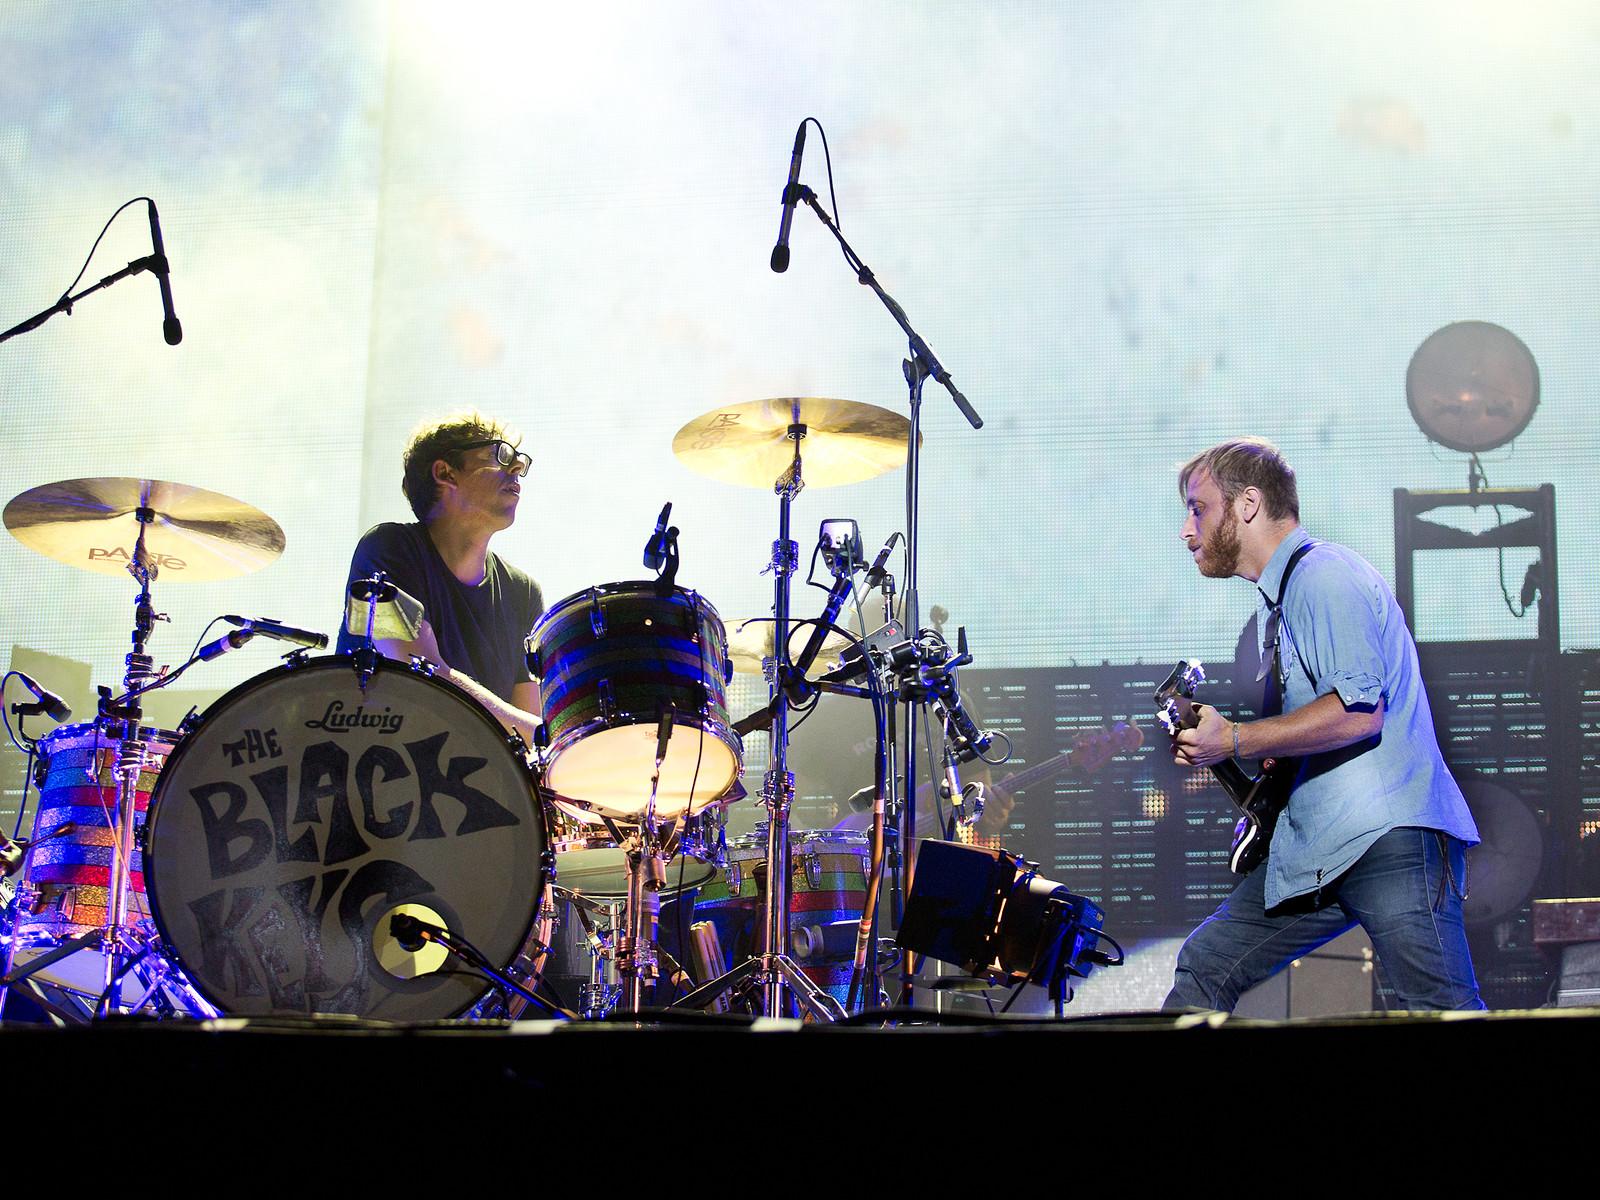 The Black Keys @ Lollapalooza 2012